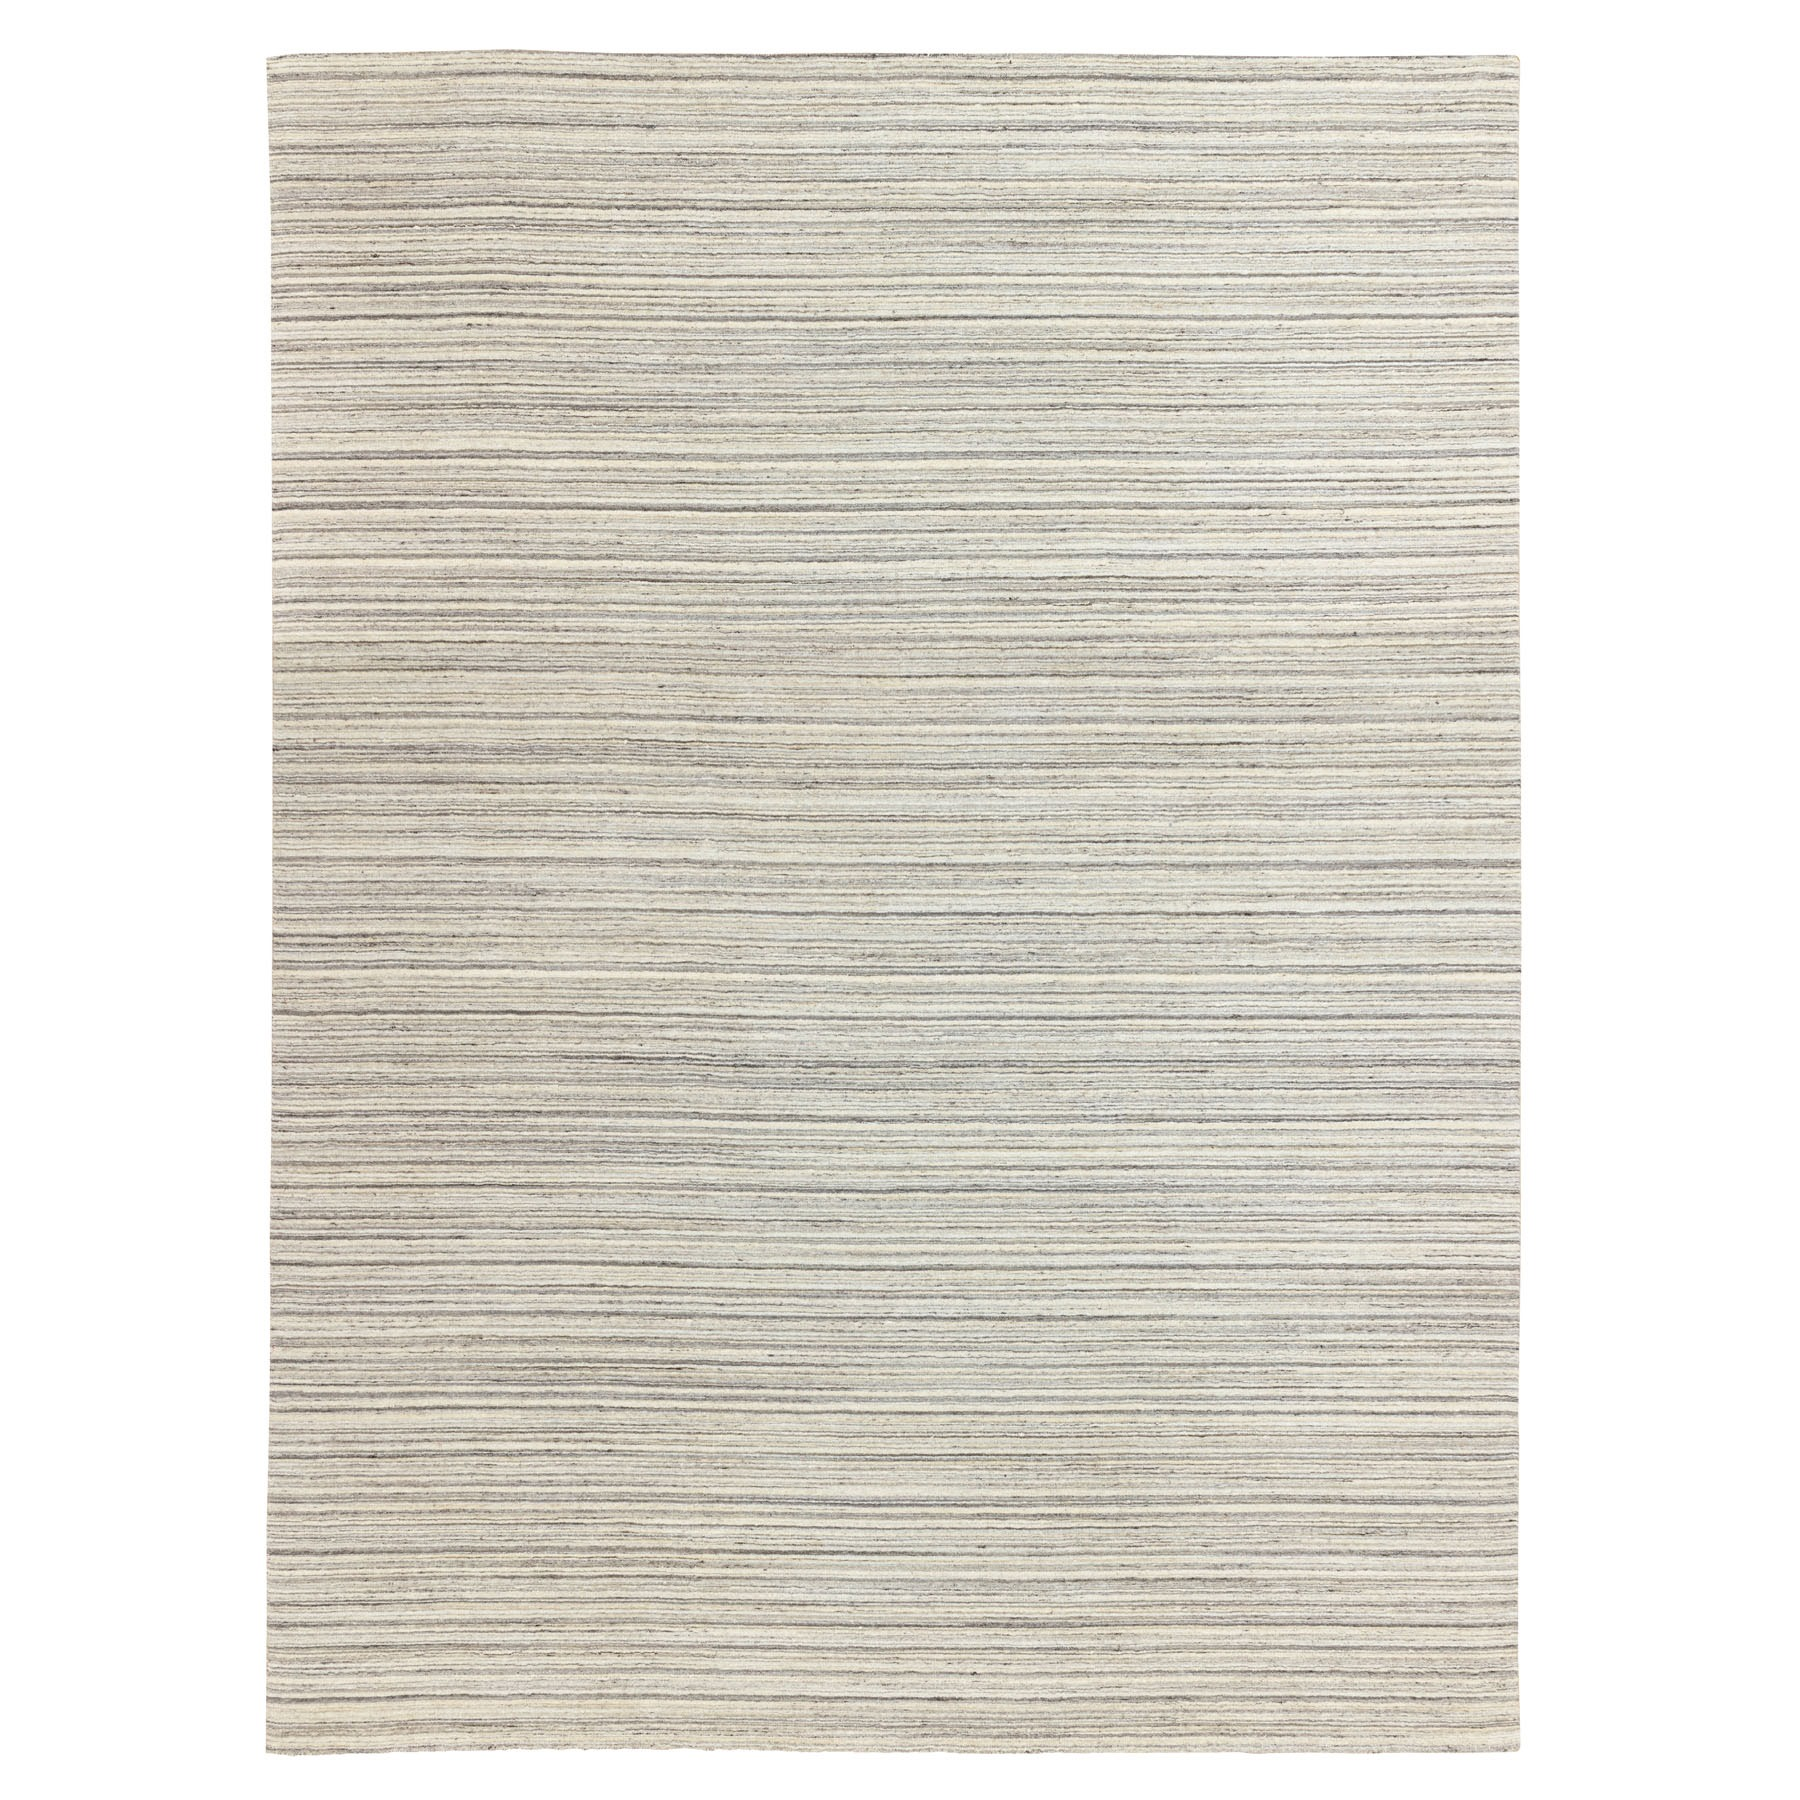 12'X15' Oversized Beige Hand Loomed Natural Wool Plain Modern Oriental Rug moae8c8d